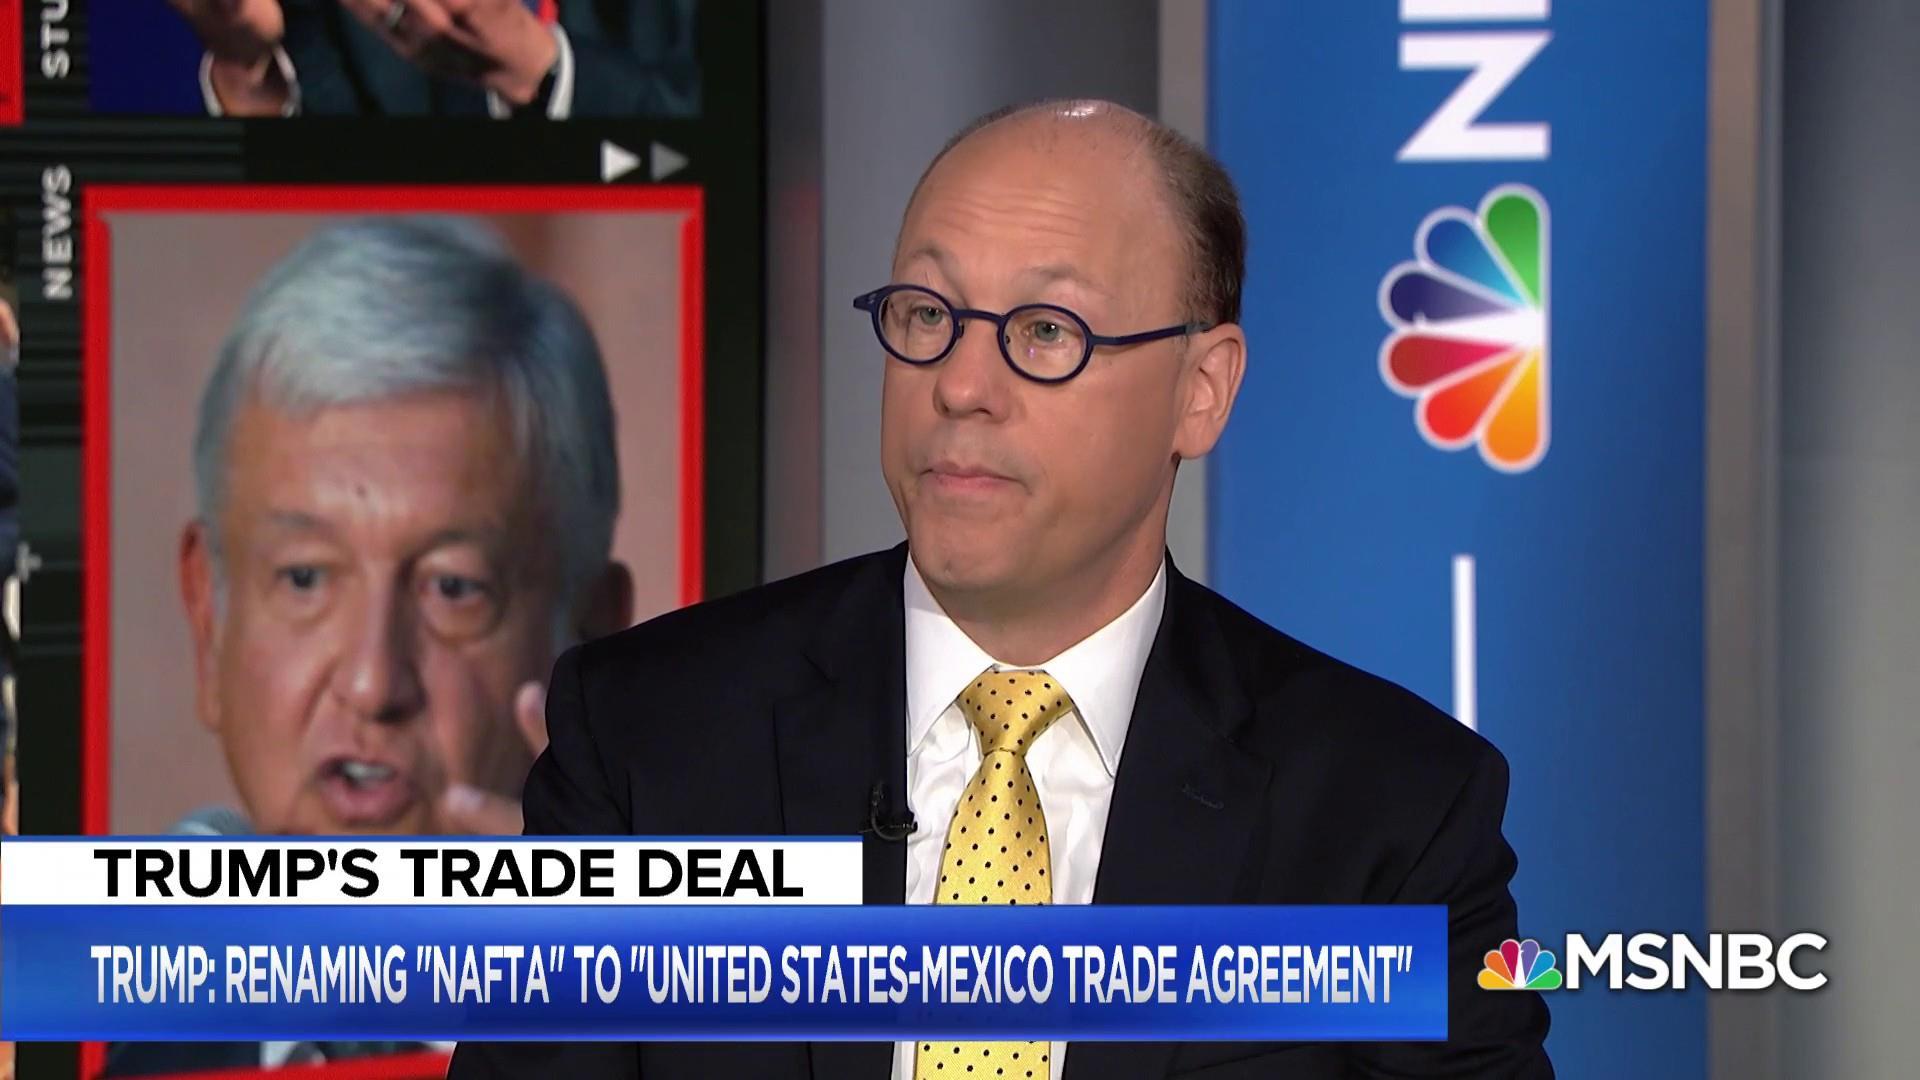 Trump announces trade deal with Mexico